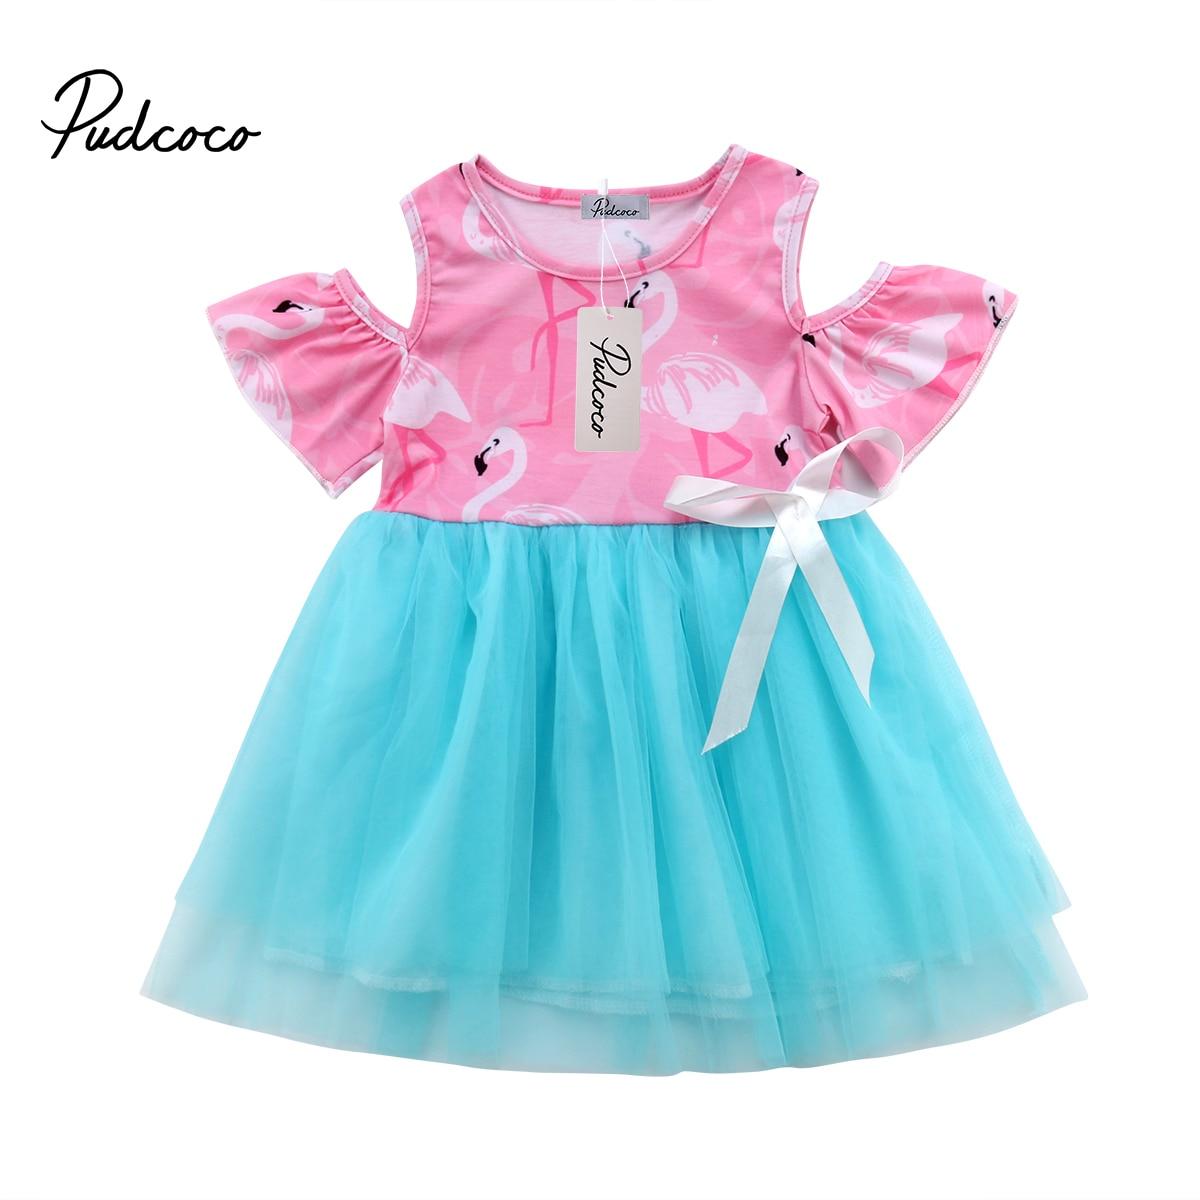 2018 Brand New Toddler Infant Kids Girl Flamingo Dress Summer Casual Off  Shoulder Tulle Dresses Chiffon b9bf6e901e09